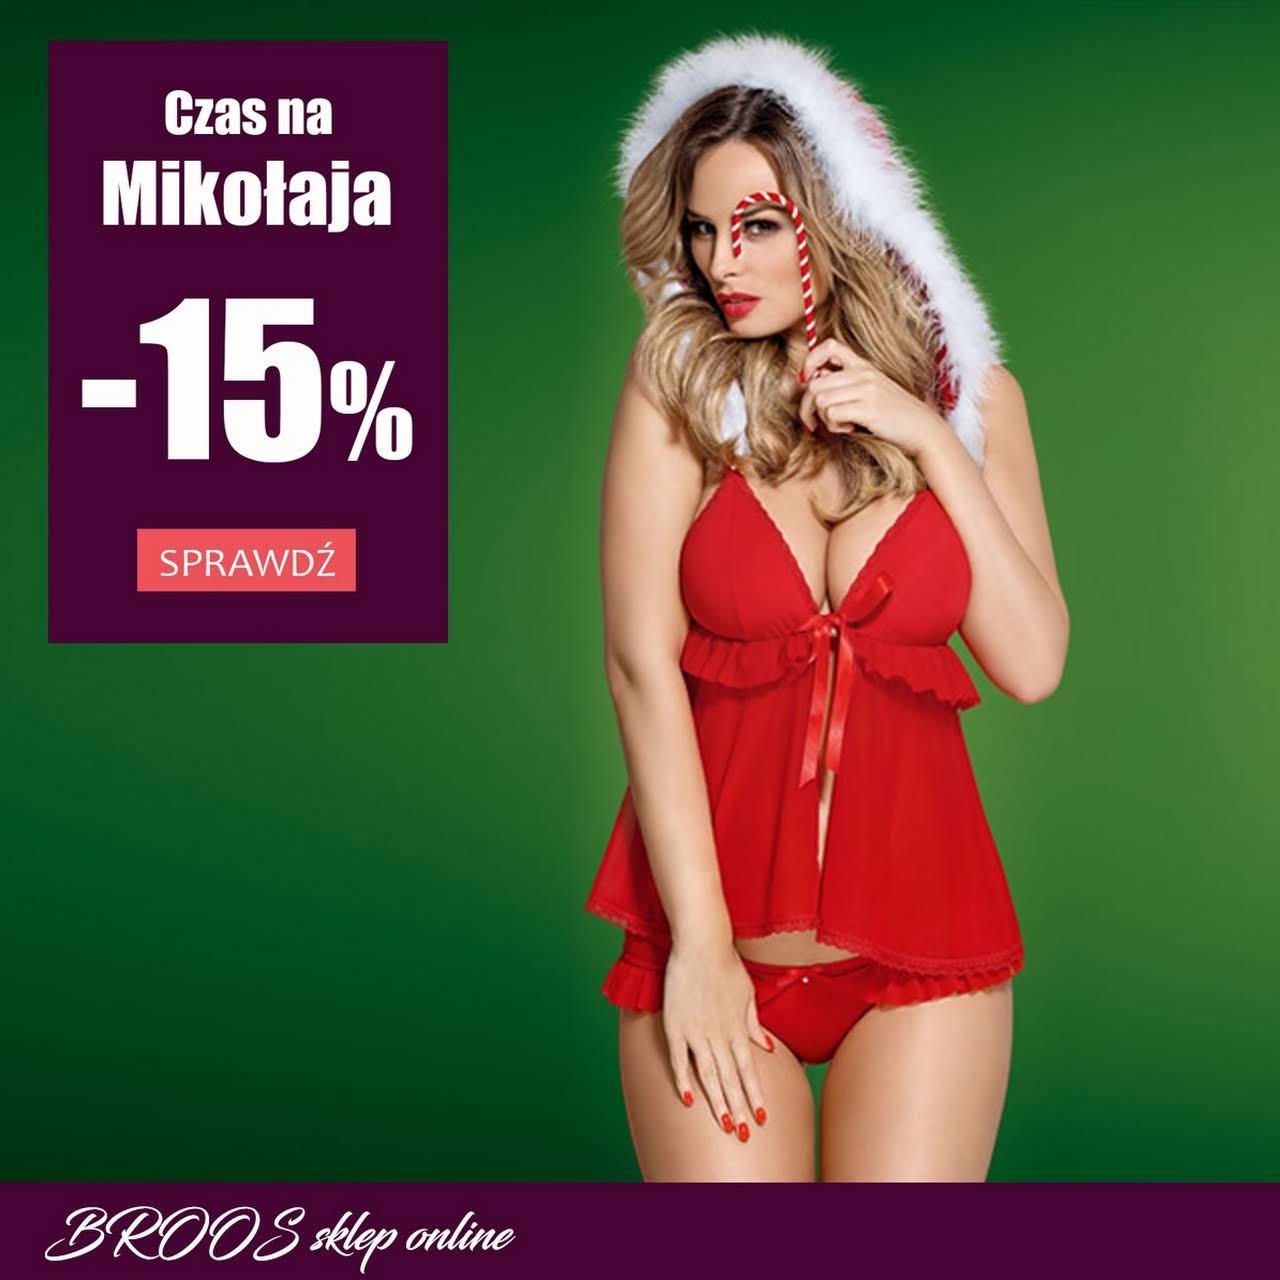 a0c5805fe0fa31 BROOS sklep online - Underwear Store w: Andrespol